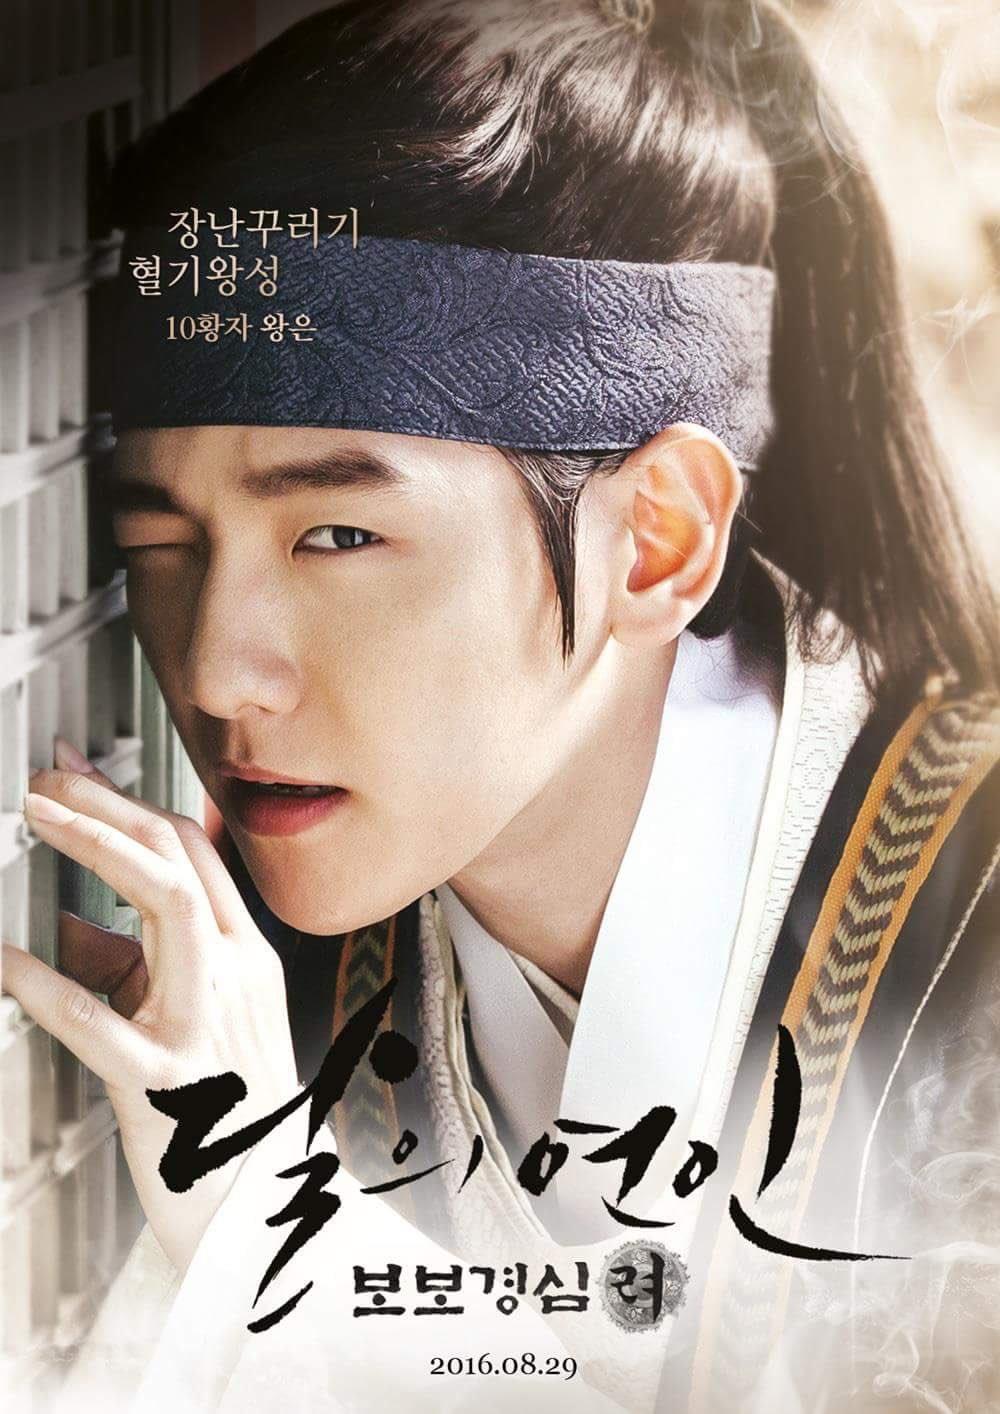 View Fullsize Byun Baekhyun Image - Scarlet Heart Ryeo Wang Eun , HD Wallpaper & Backgrounds